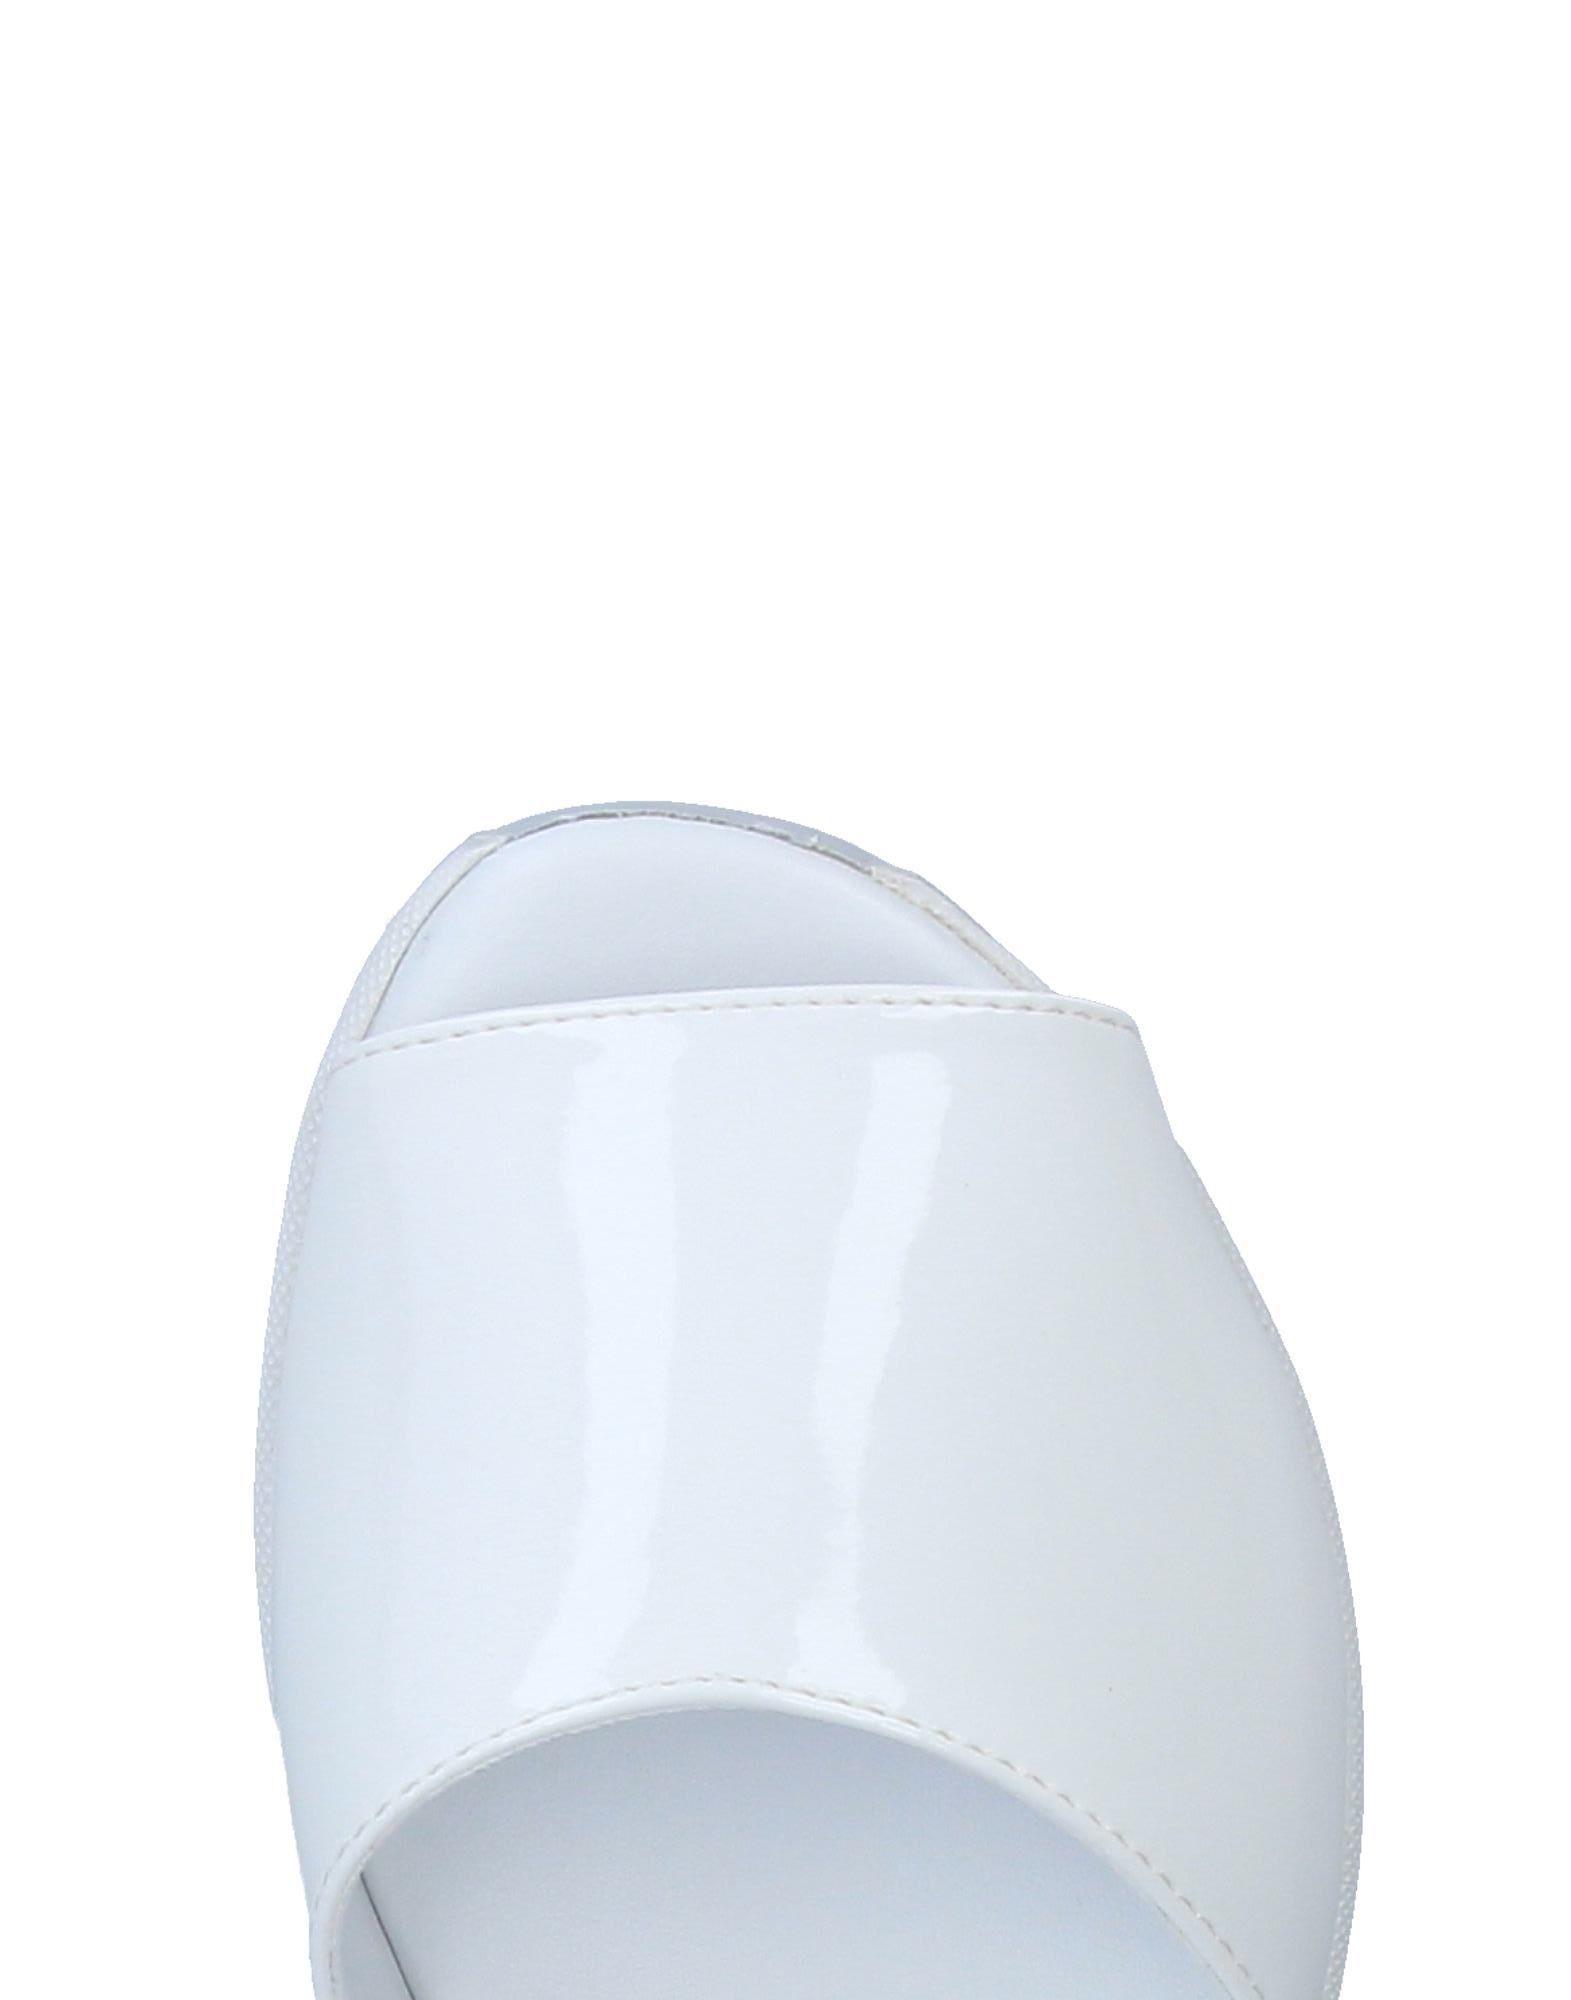 Agile By Rucoline Sandalen Damen  Qualität 11334401SI Gute Qualität  beliebte Schuhe 7a1669